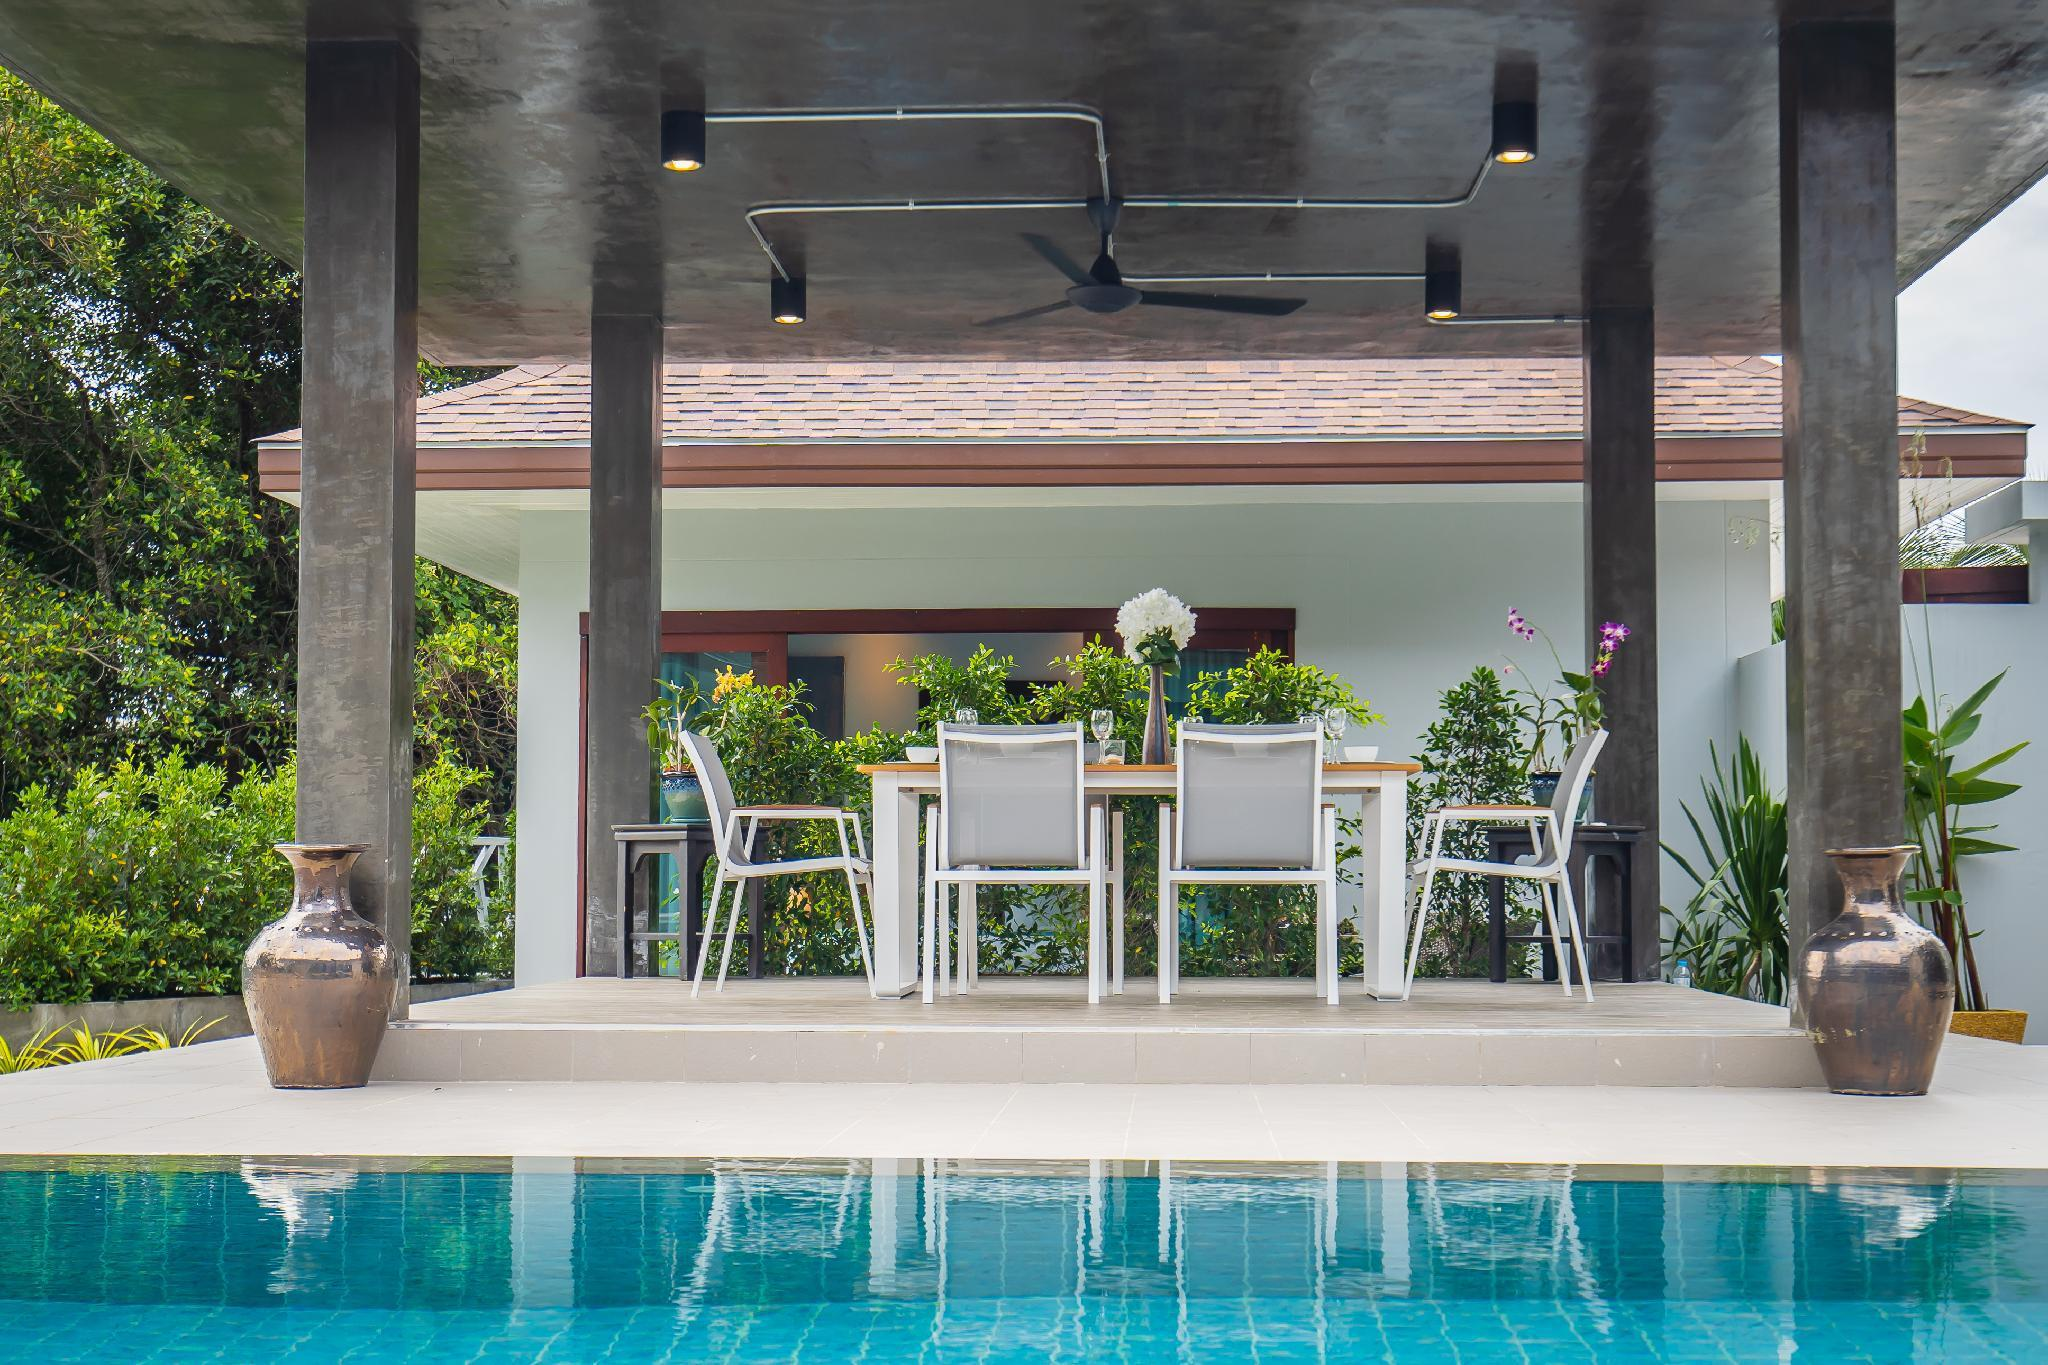 Bangtao Boutique Villa (Private Pool Villa) บางเทา บูทิค วิลล่า